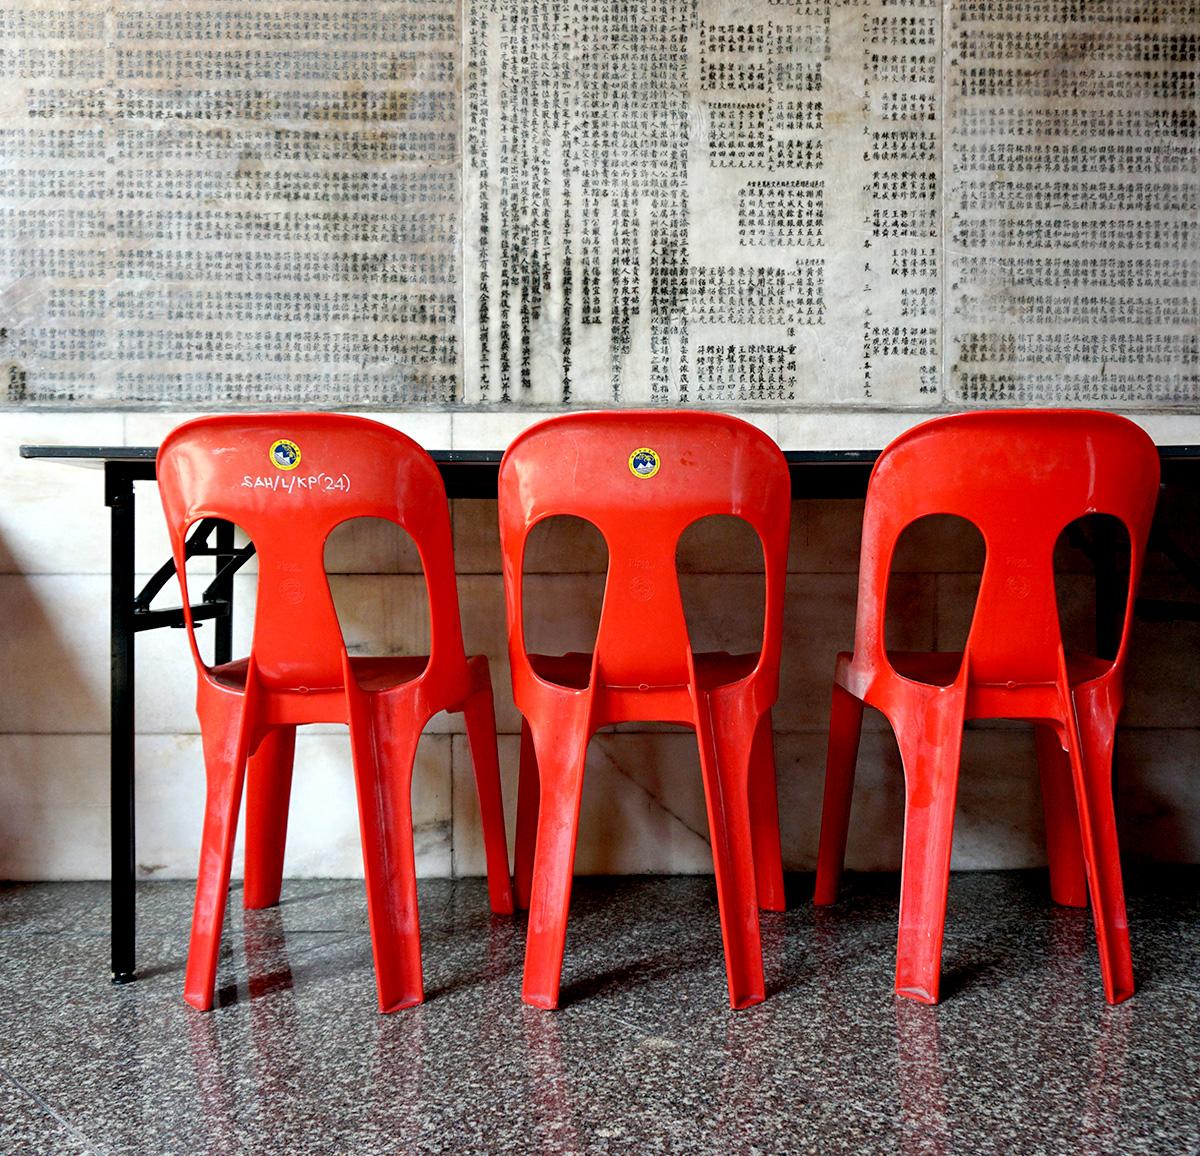 Chairs in Penang, Malaysia